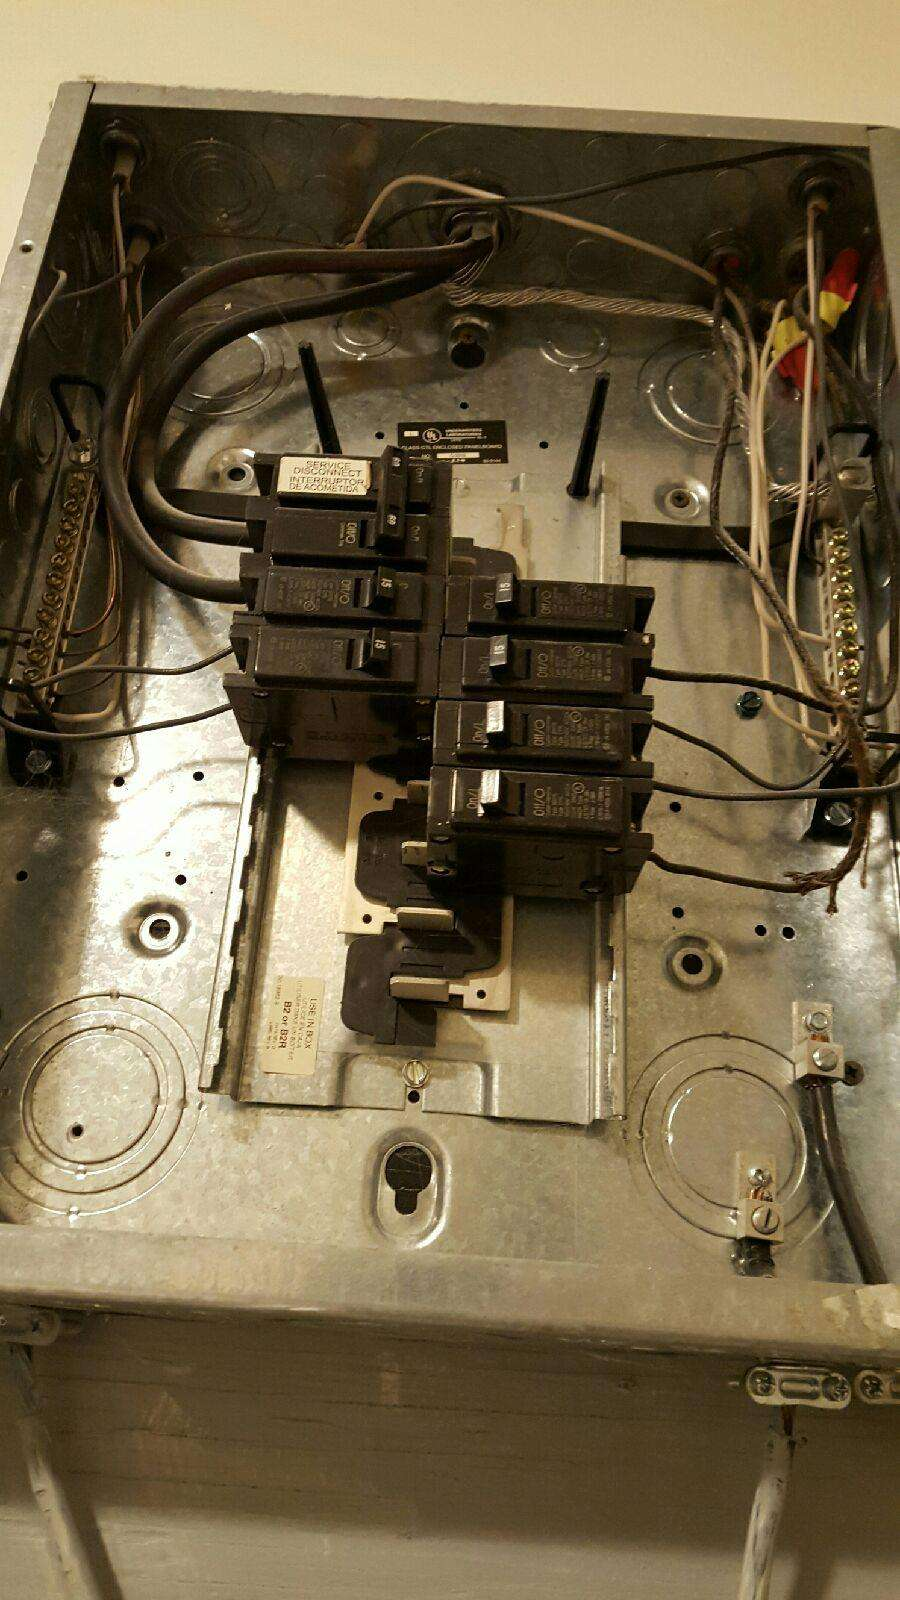 Haddad Electric LLC - electrician  | Photo 5 of 10 | Address: 300 Washington Ave #5, Carlstadt, NJ 07072, USA | Phone: (201) 438-4242